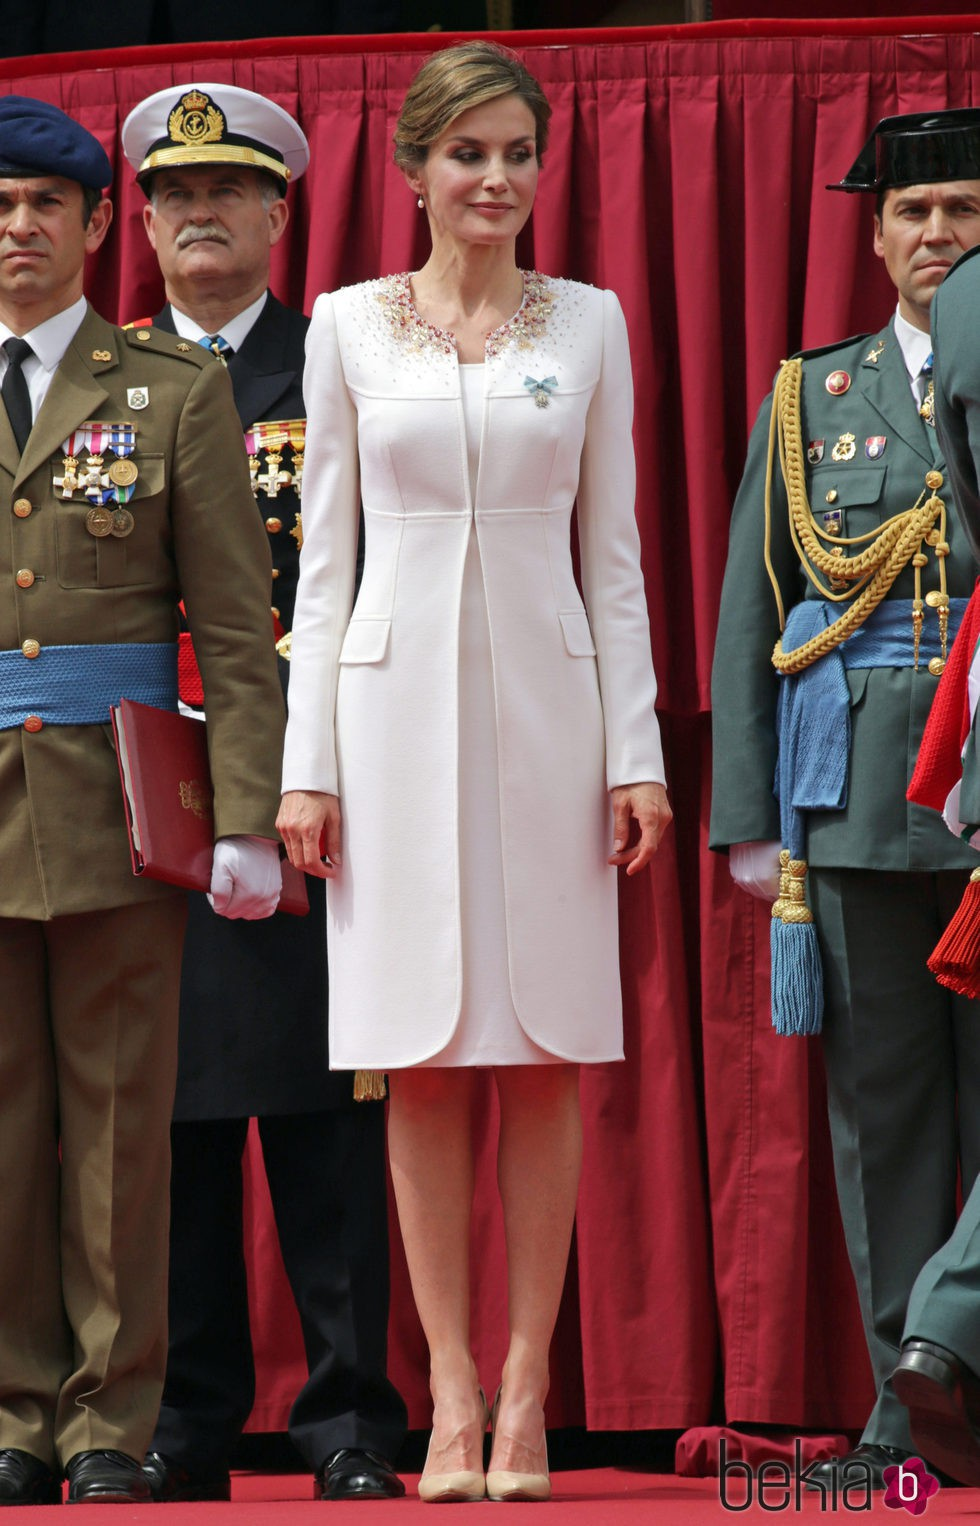 La Reina Letizia con un vestido blanco de Felipe Varela en la entrega de la Enseña Nacional a la XI Zona de la Guardia Civil